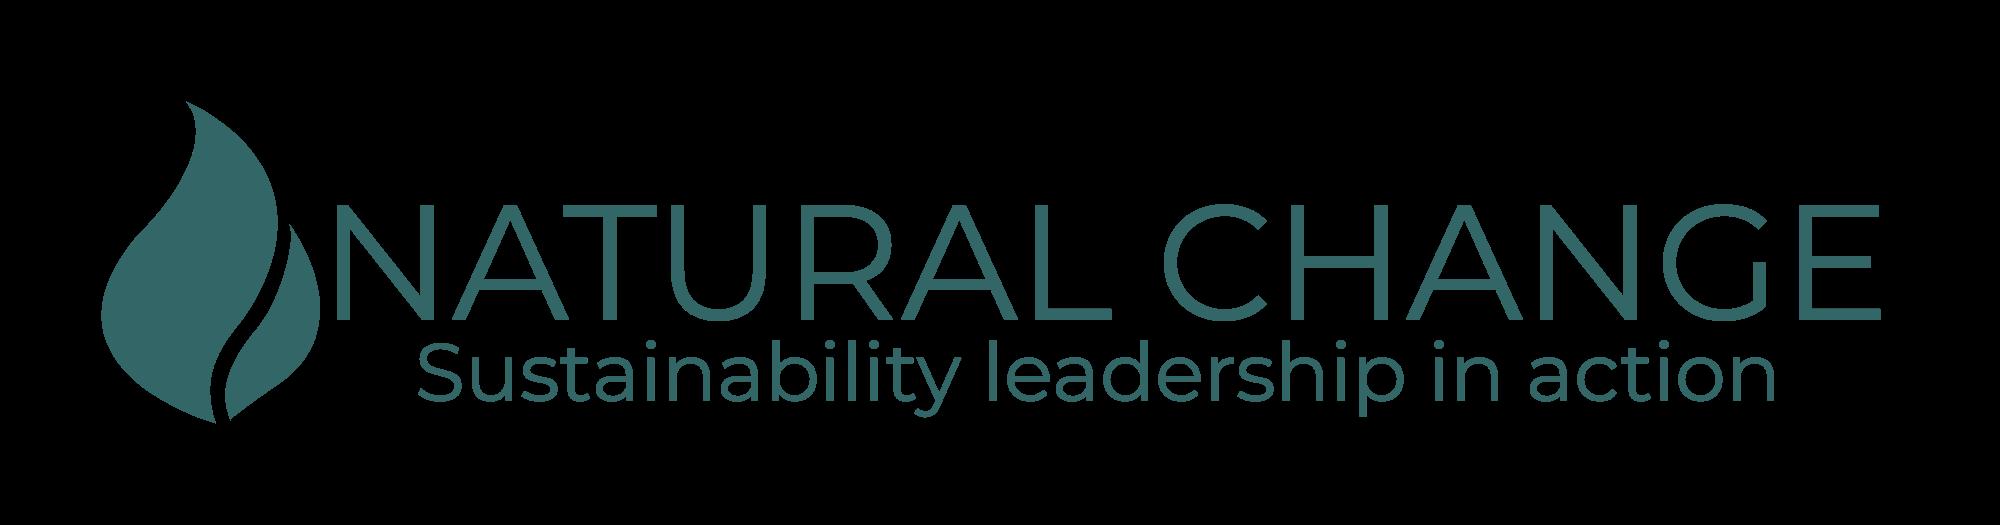 Natural Change logo